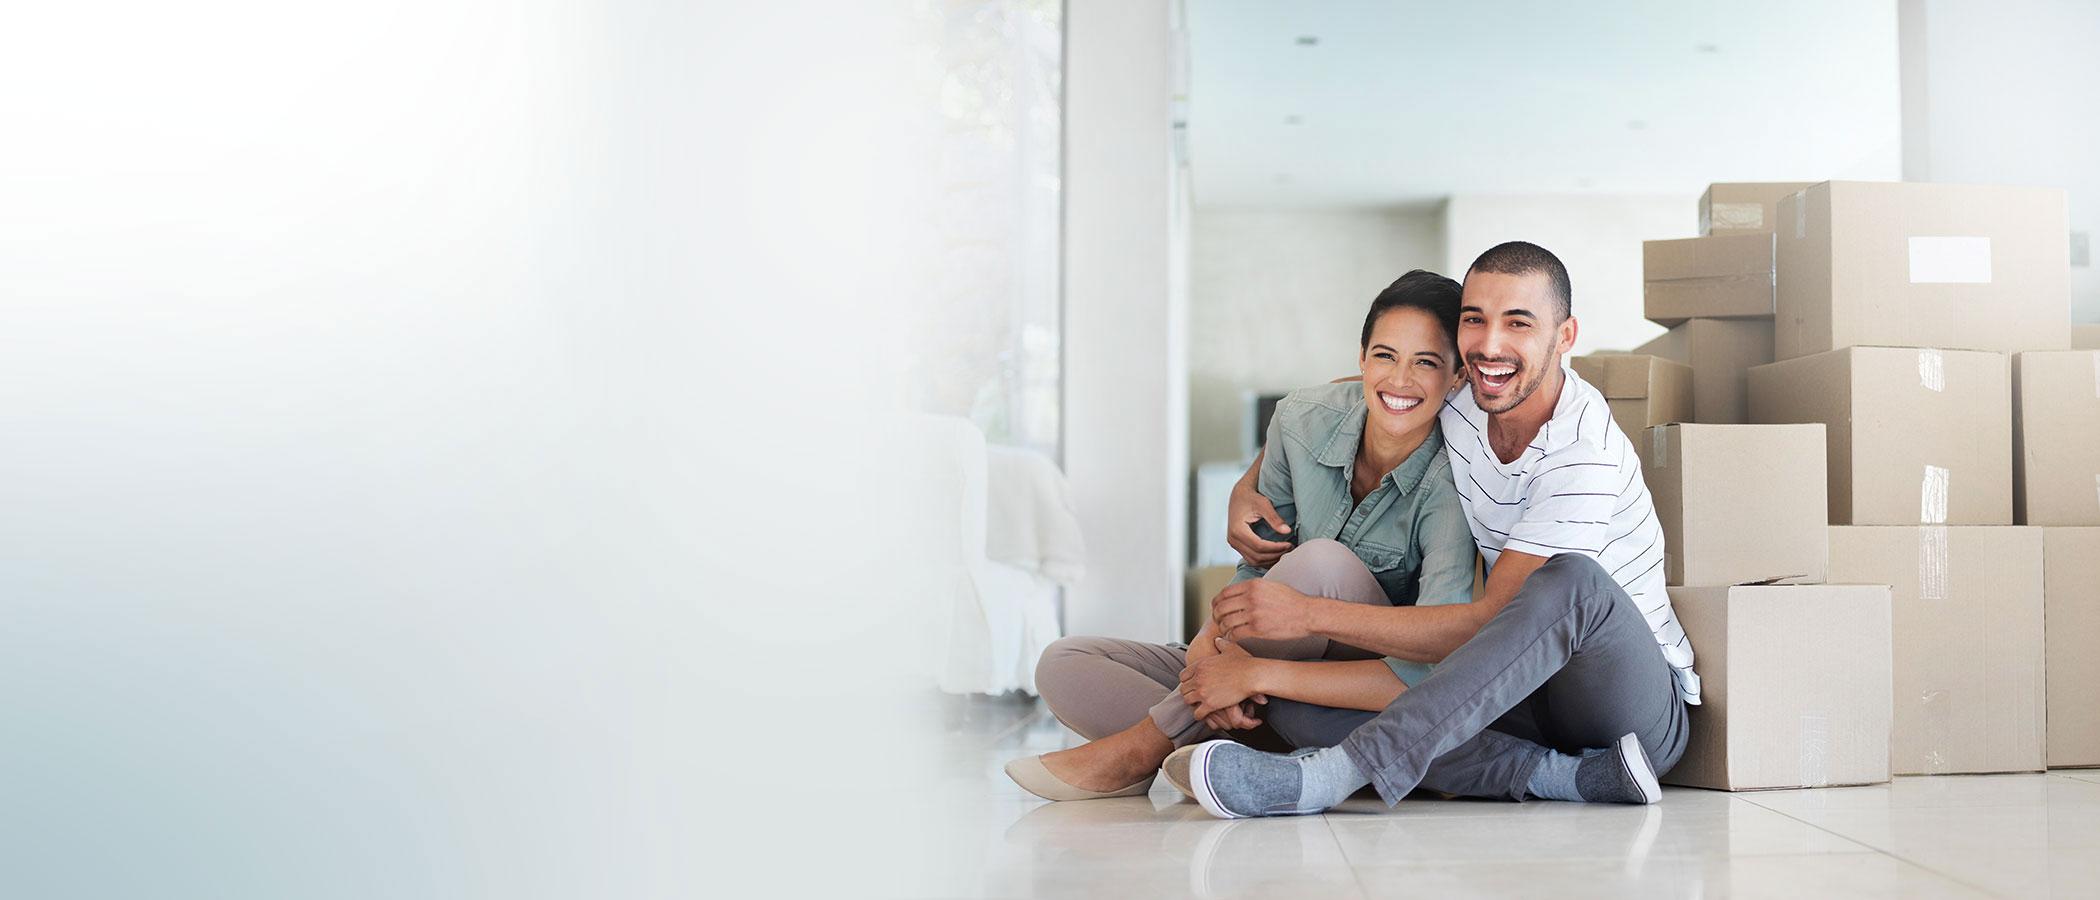 immobilienfinanzierungs kredit vergleich immo. Black Bedroom Furniture Sets. Home Design Ideas